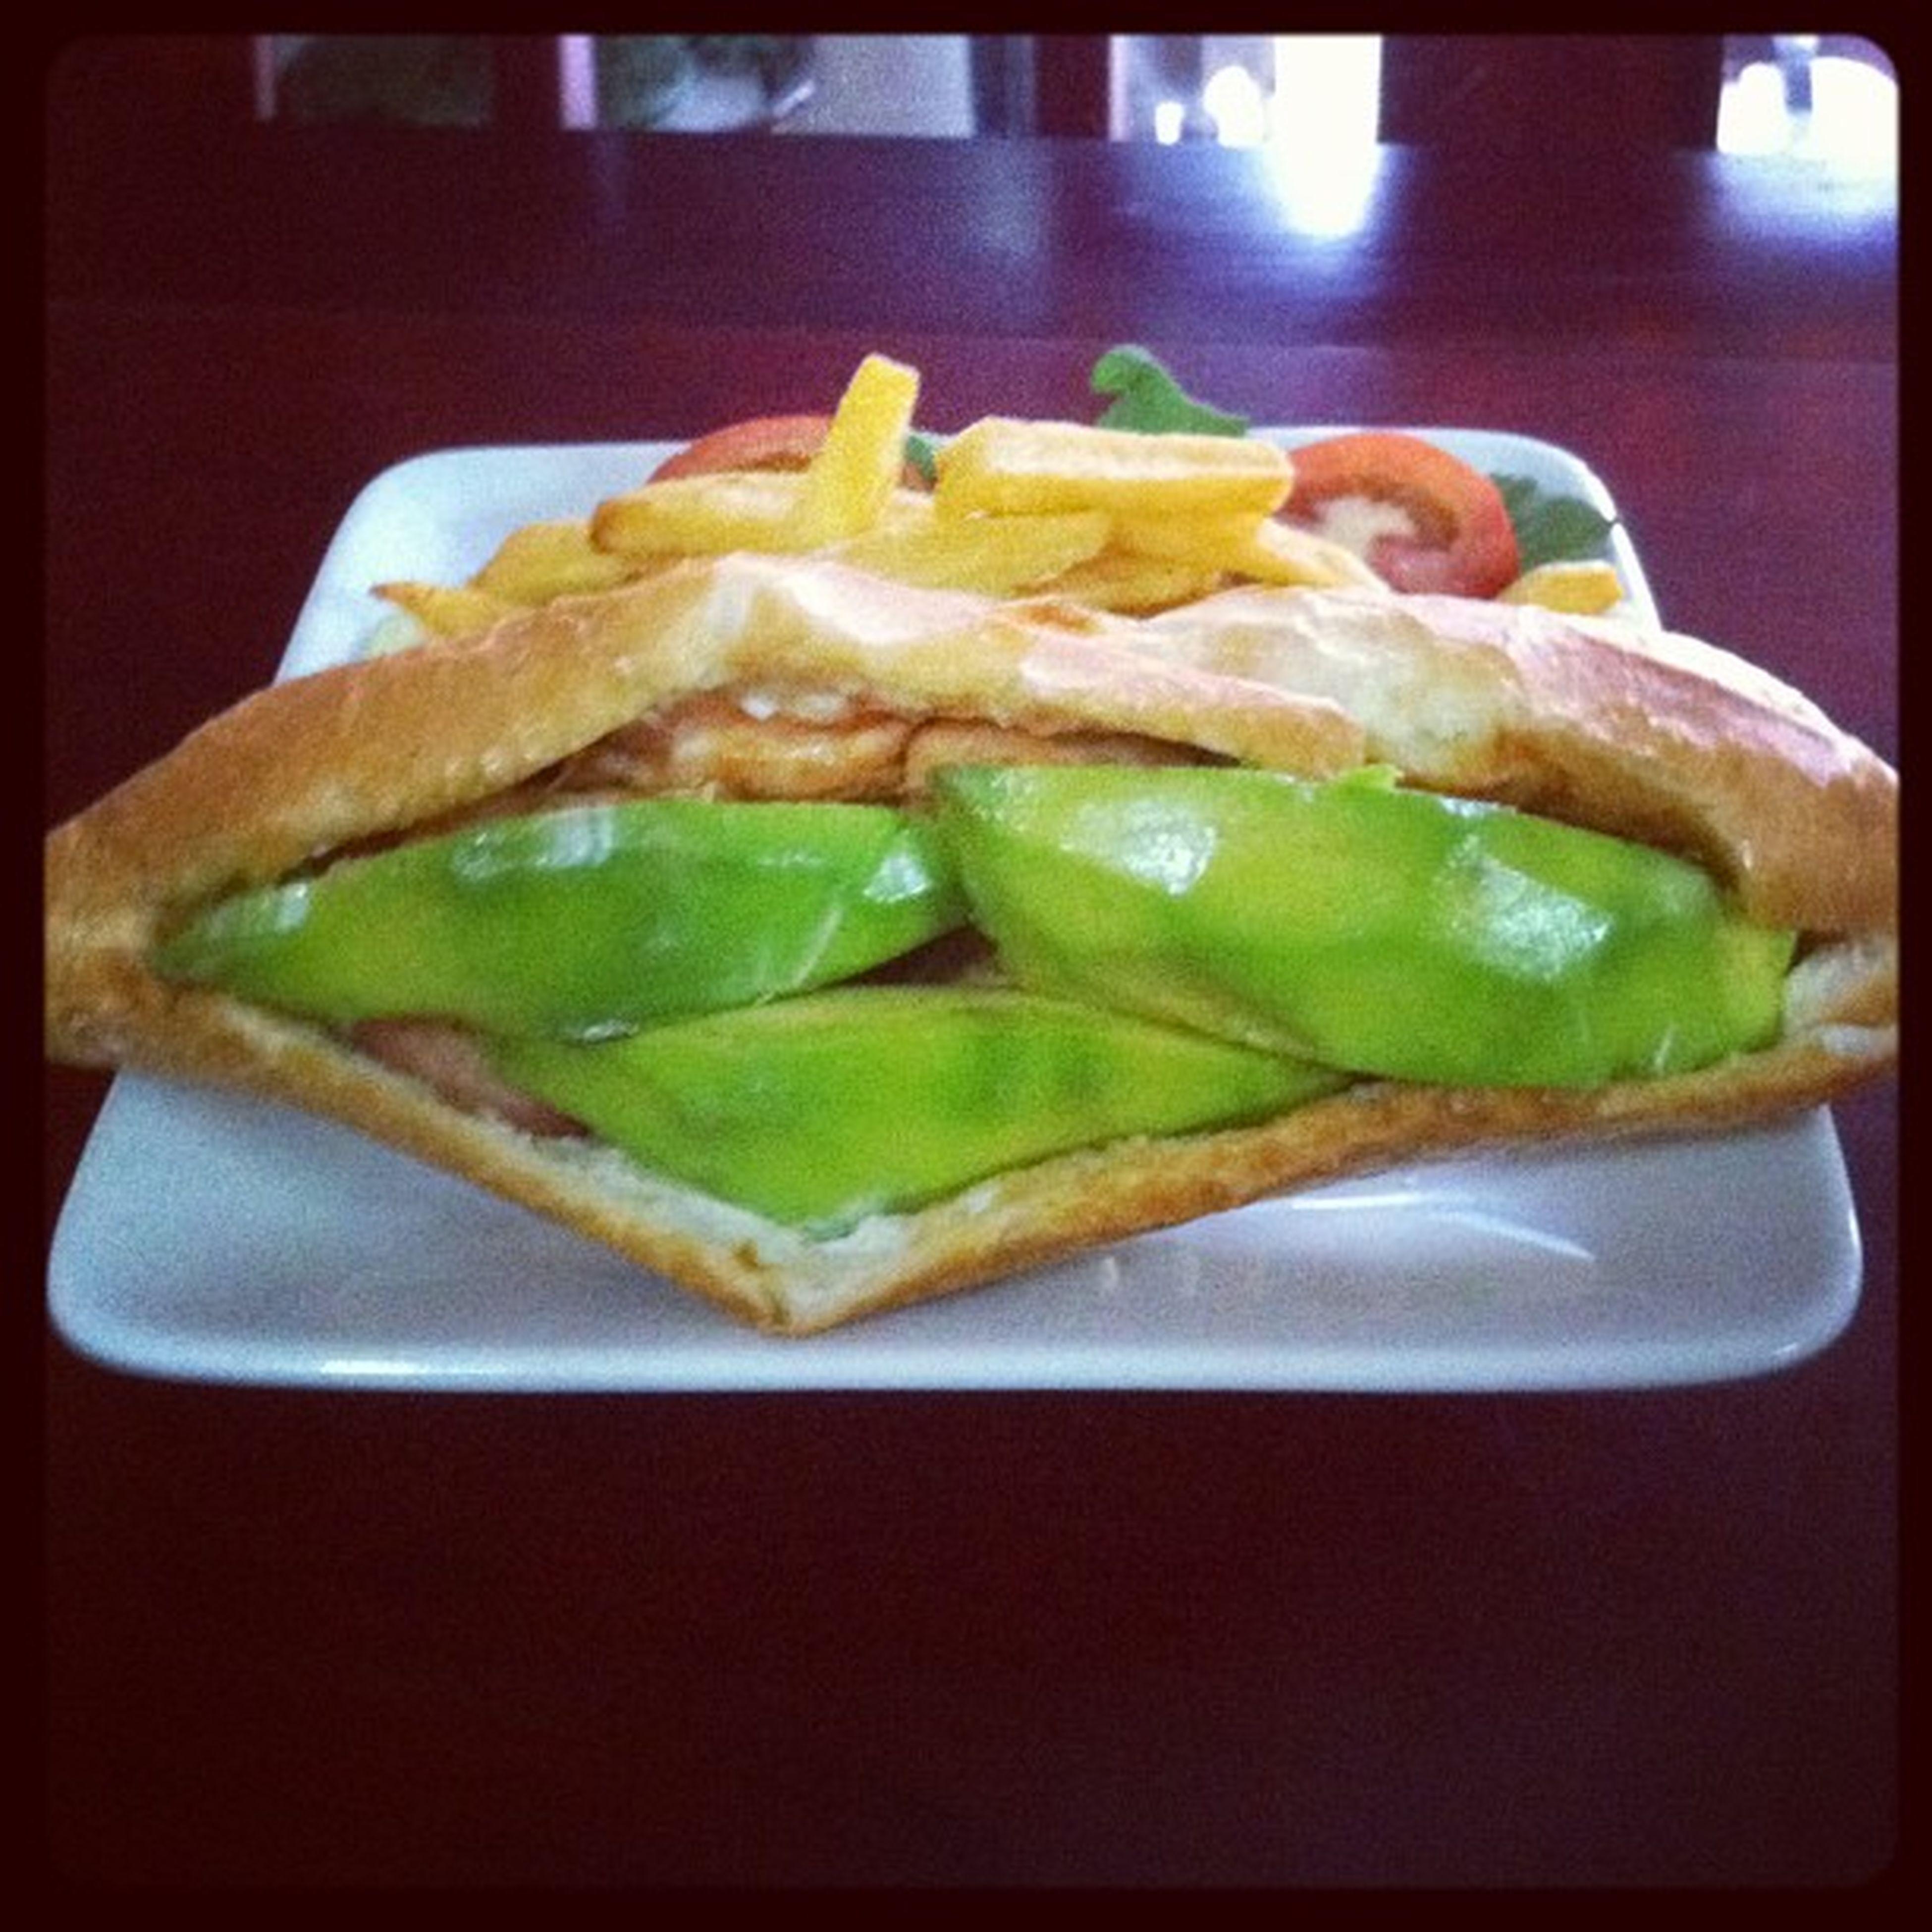 Sayn hello Avocado Chicken Sandwich for 2$ in #hue #vietnam Vietnam Huế